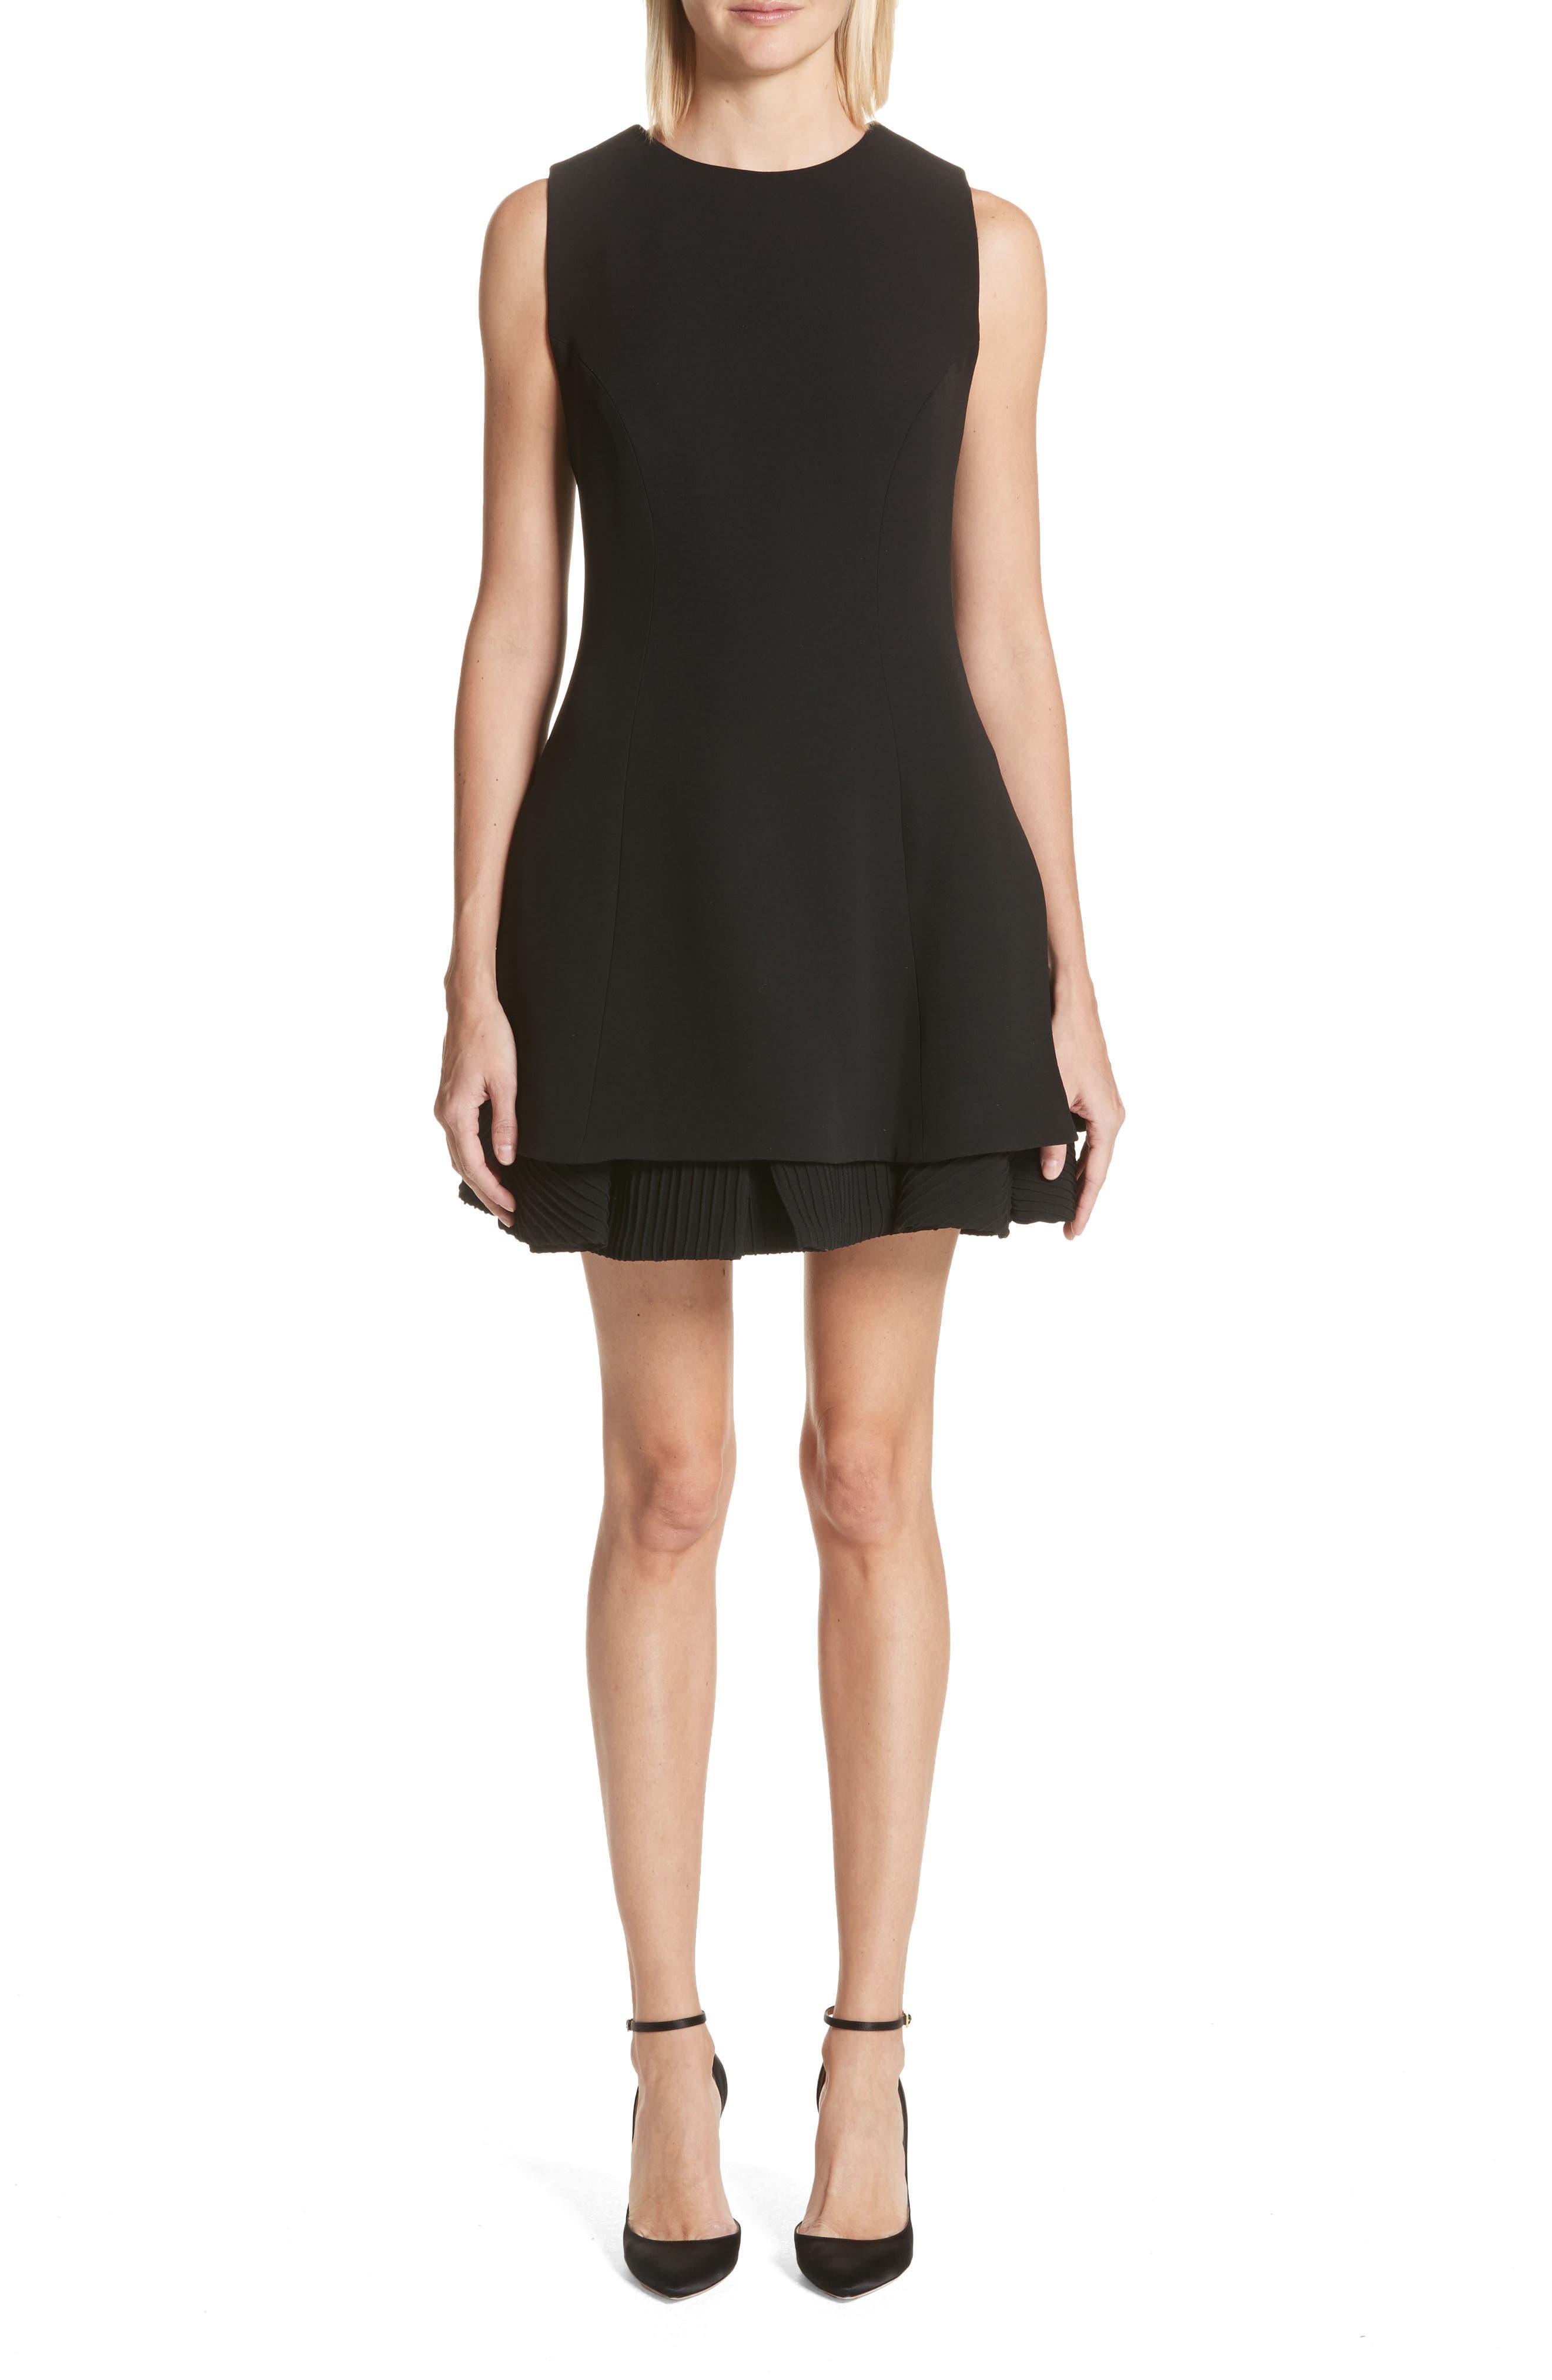 Alternate Image 1 Selected - Brandon Maxwell Pleated Hem Fit & Flare Dress